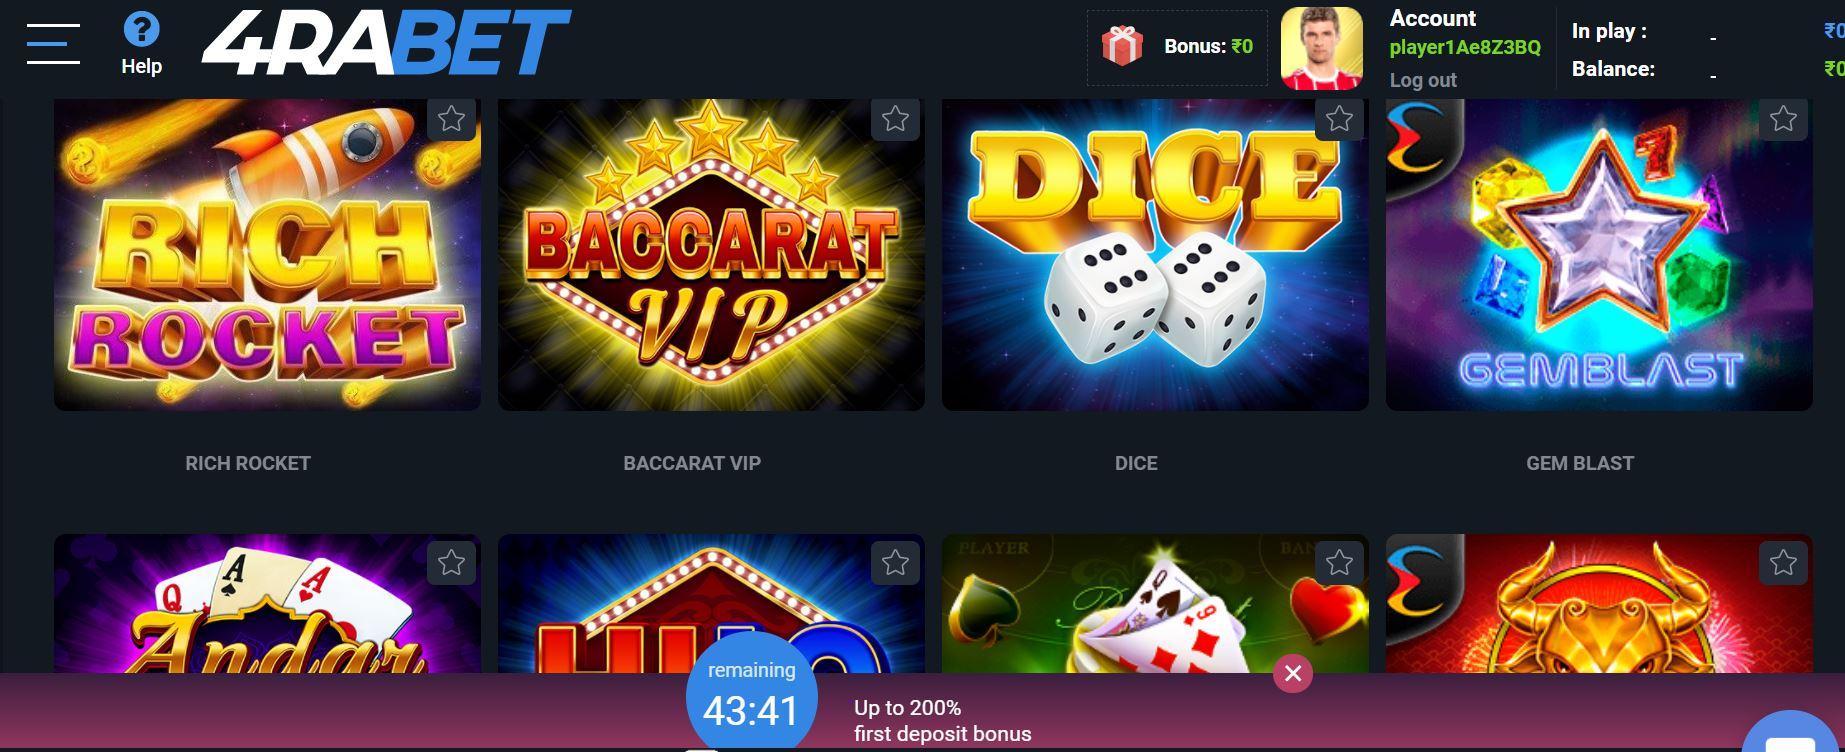 4rabet casino lobby